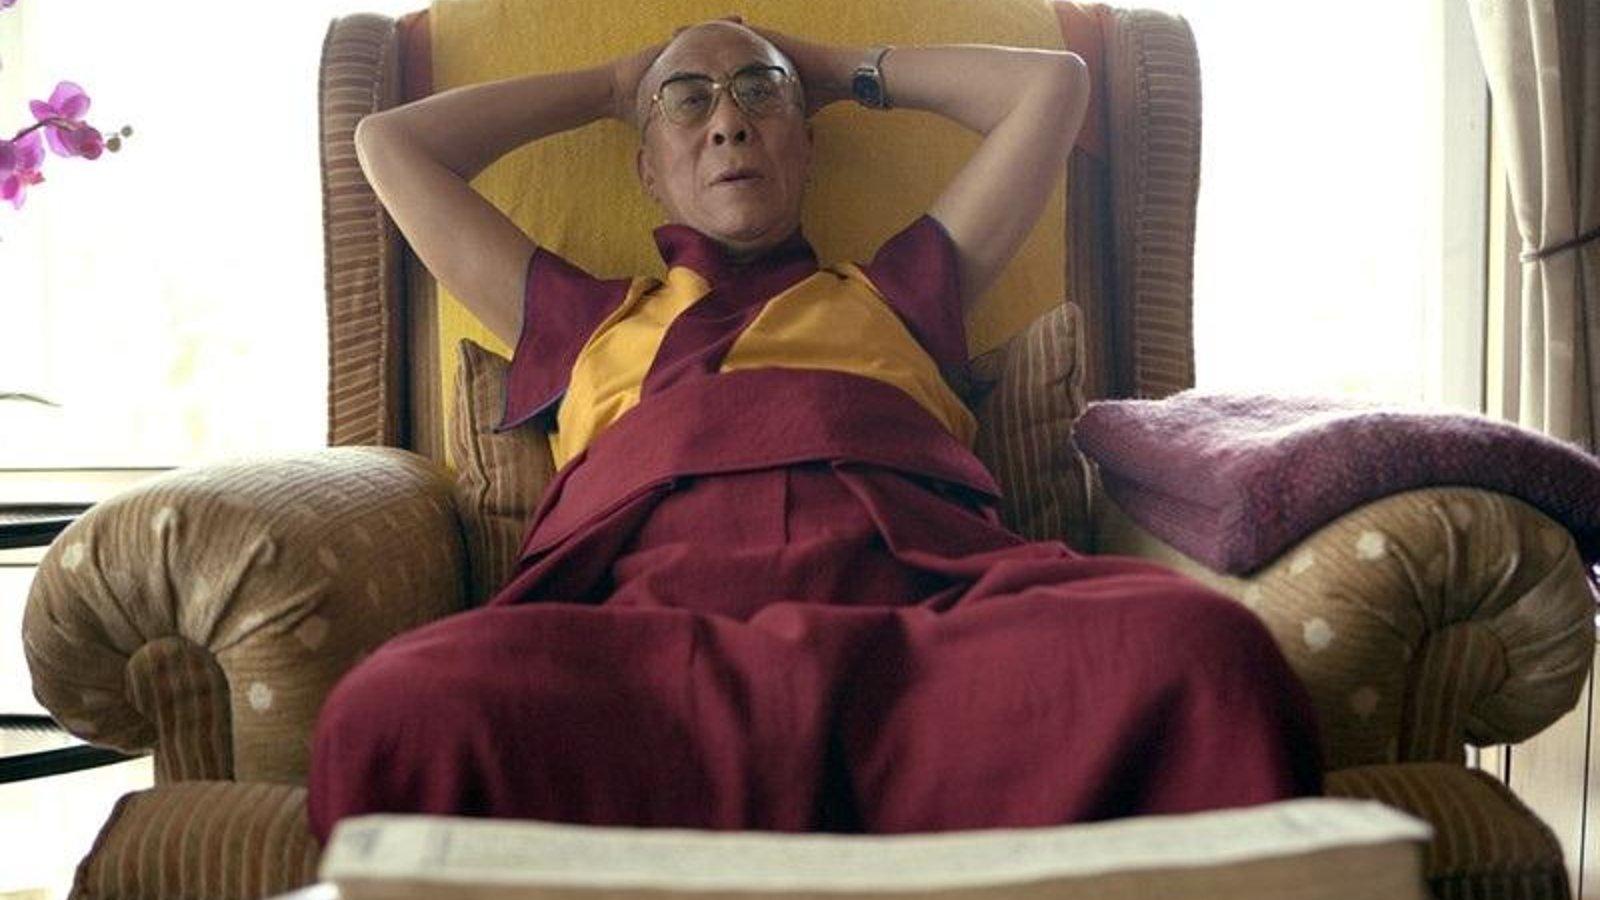 Sunrise/Sunset - A Day in the Life of the Dalai Lama